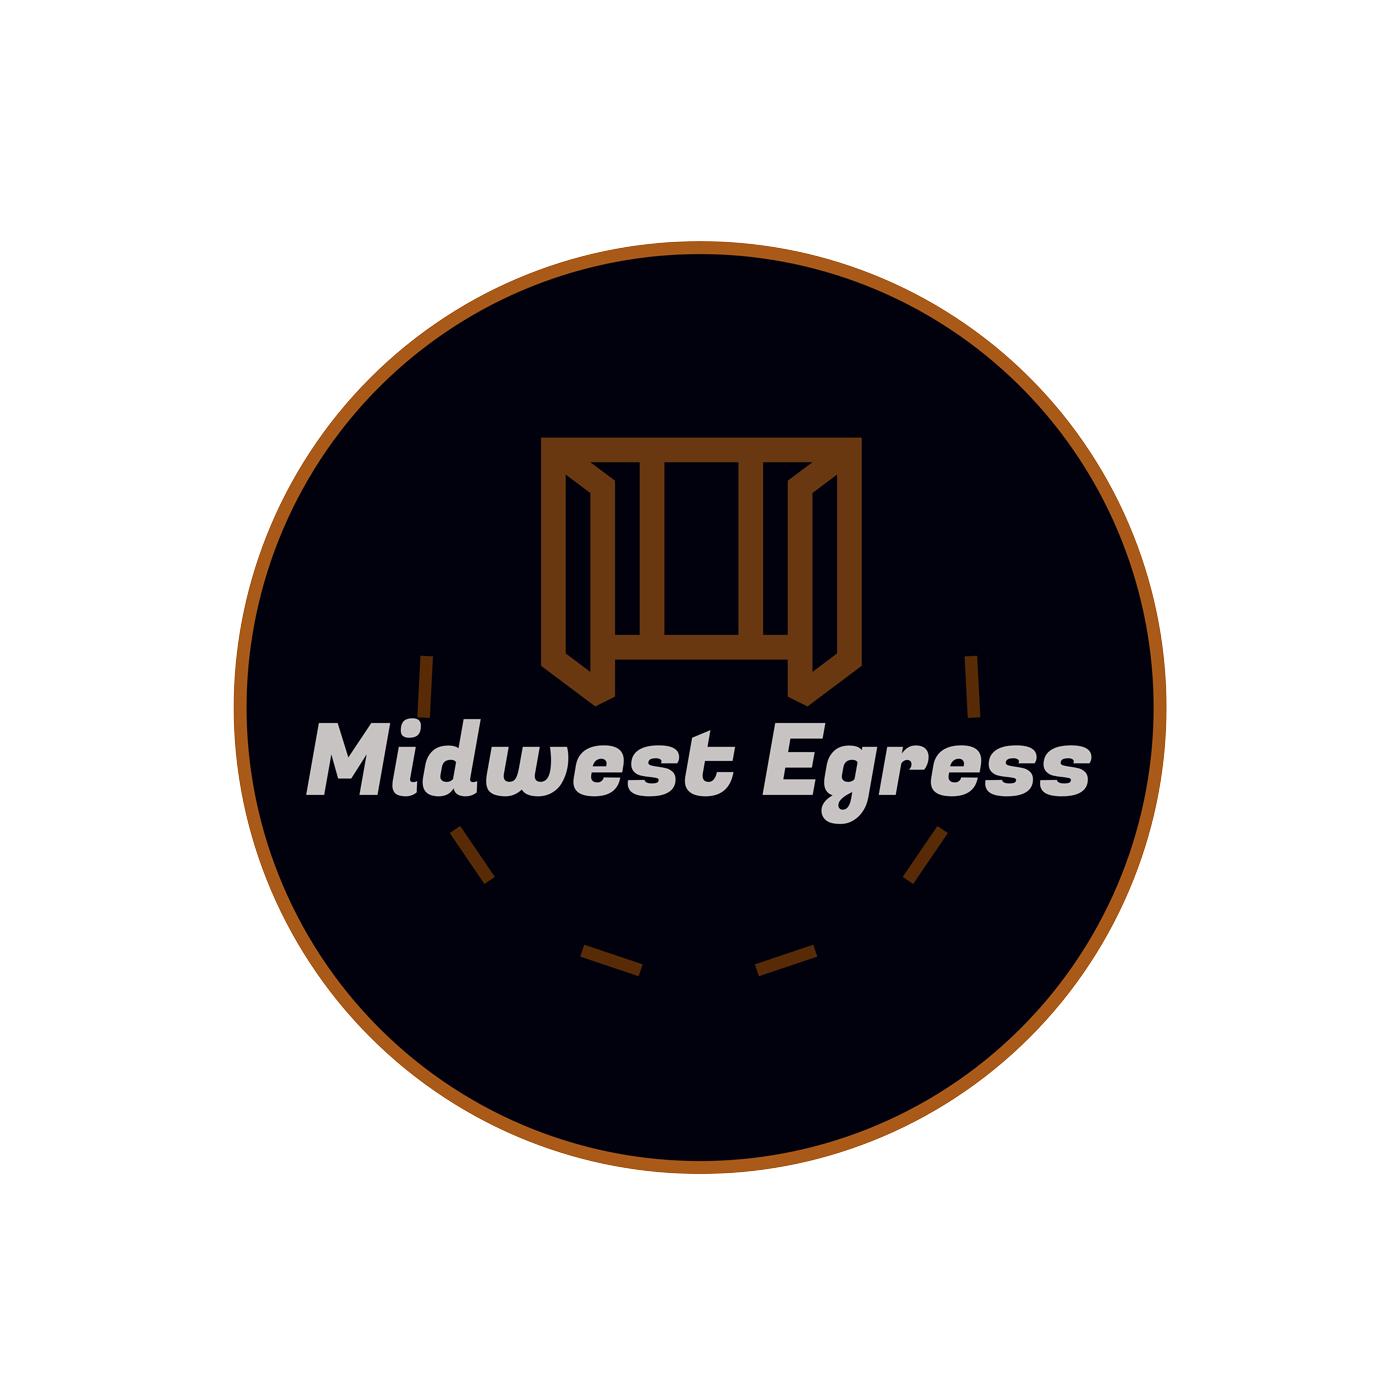 Midwest Egress